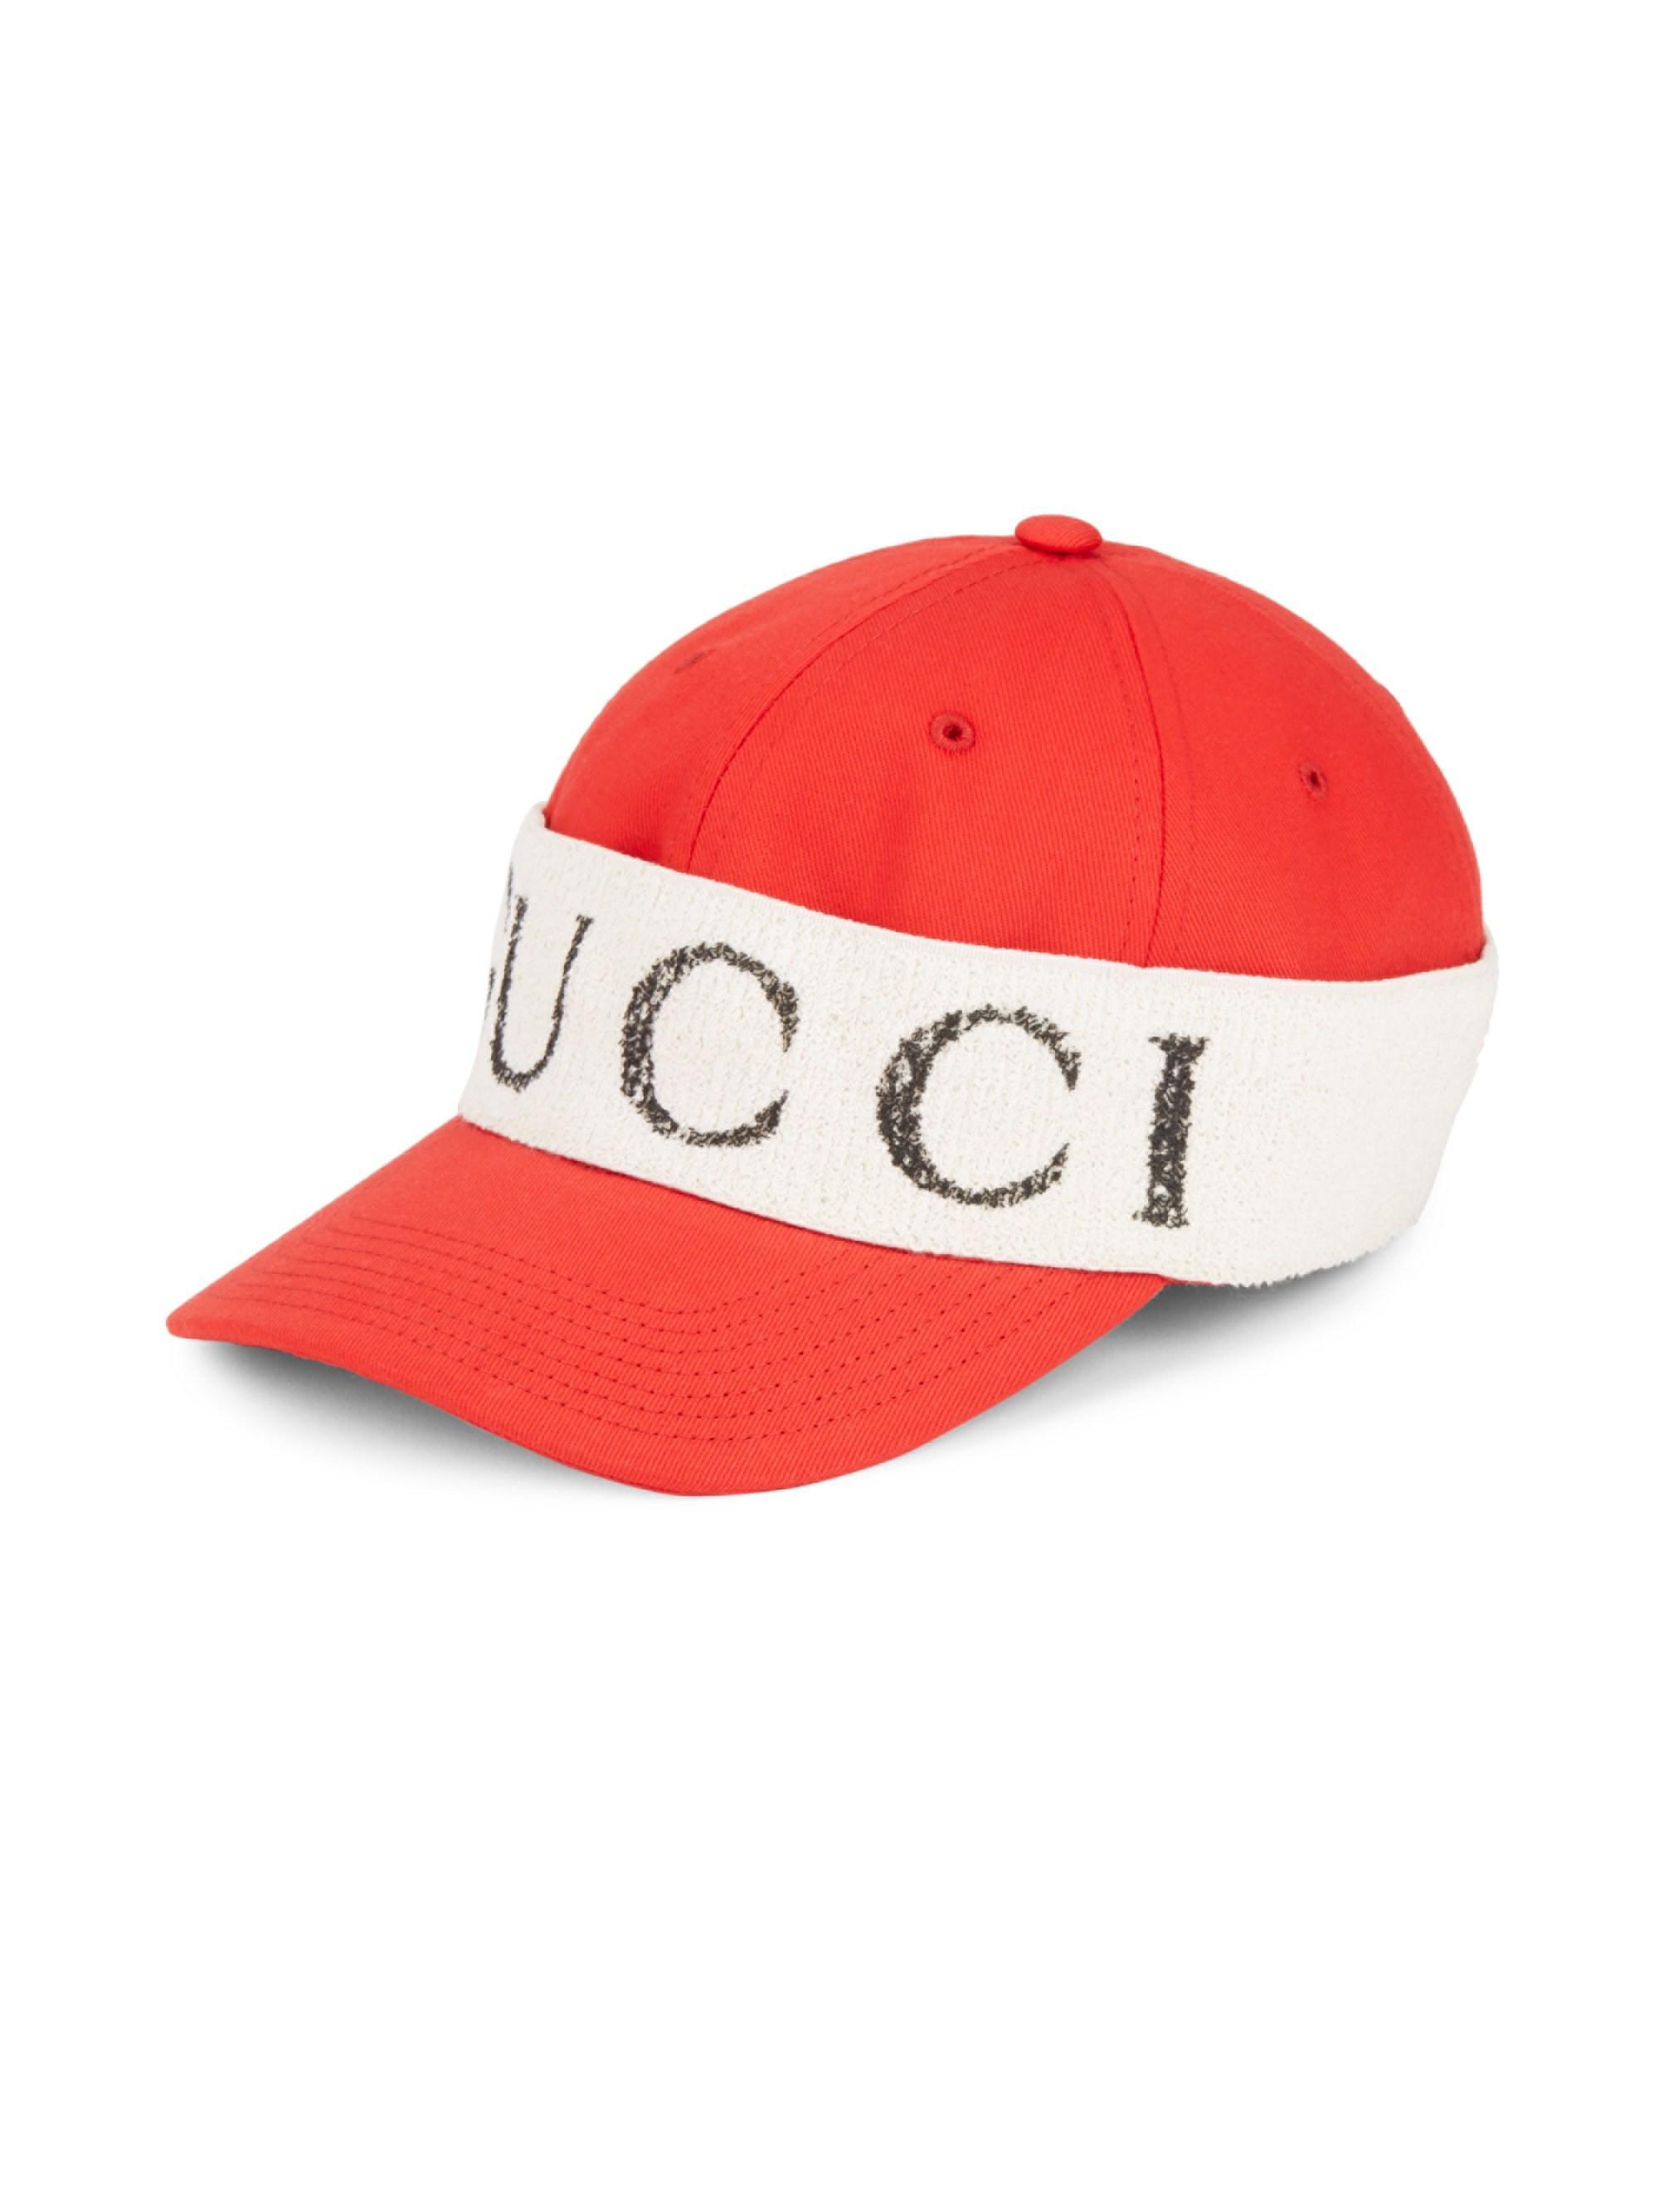 171b28a3b25 Lyst - Gucci Men s Wrap Baseball Cap - Black White - Size Small in ...